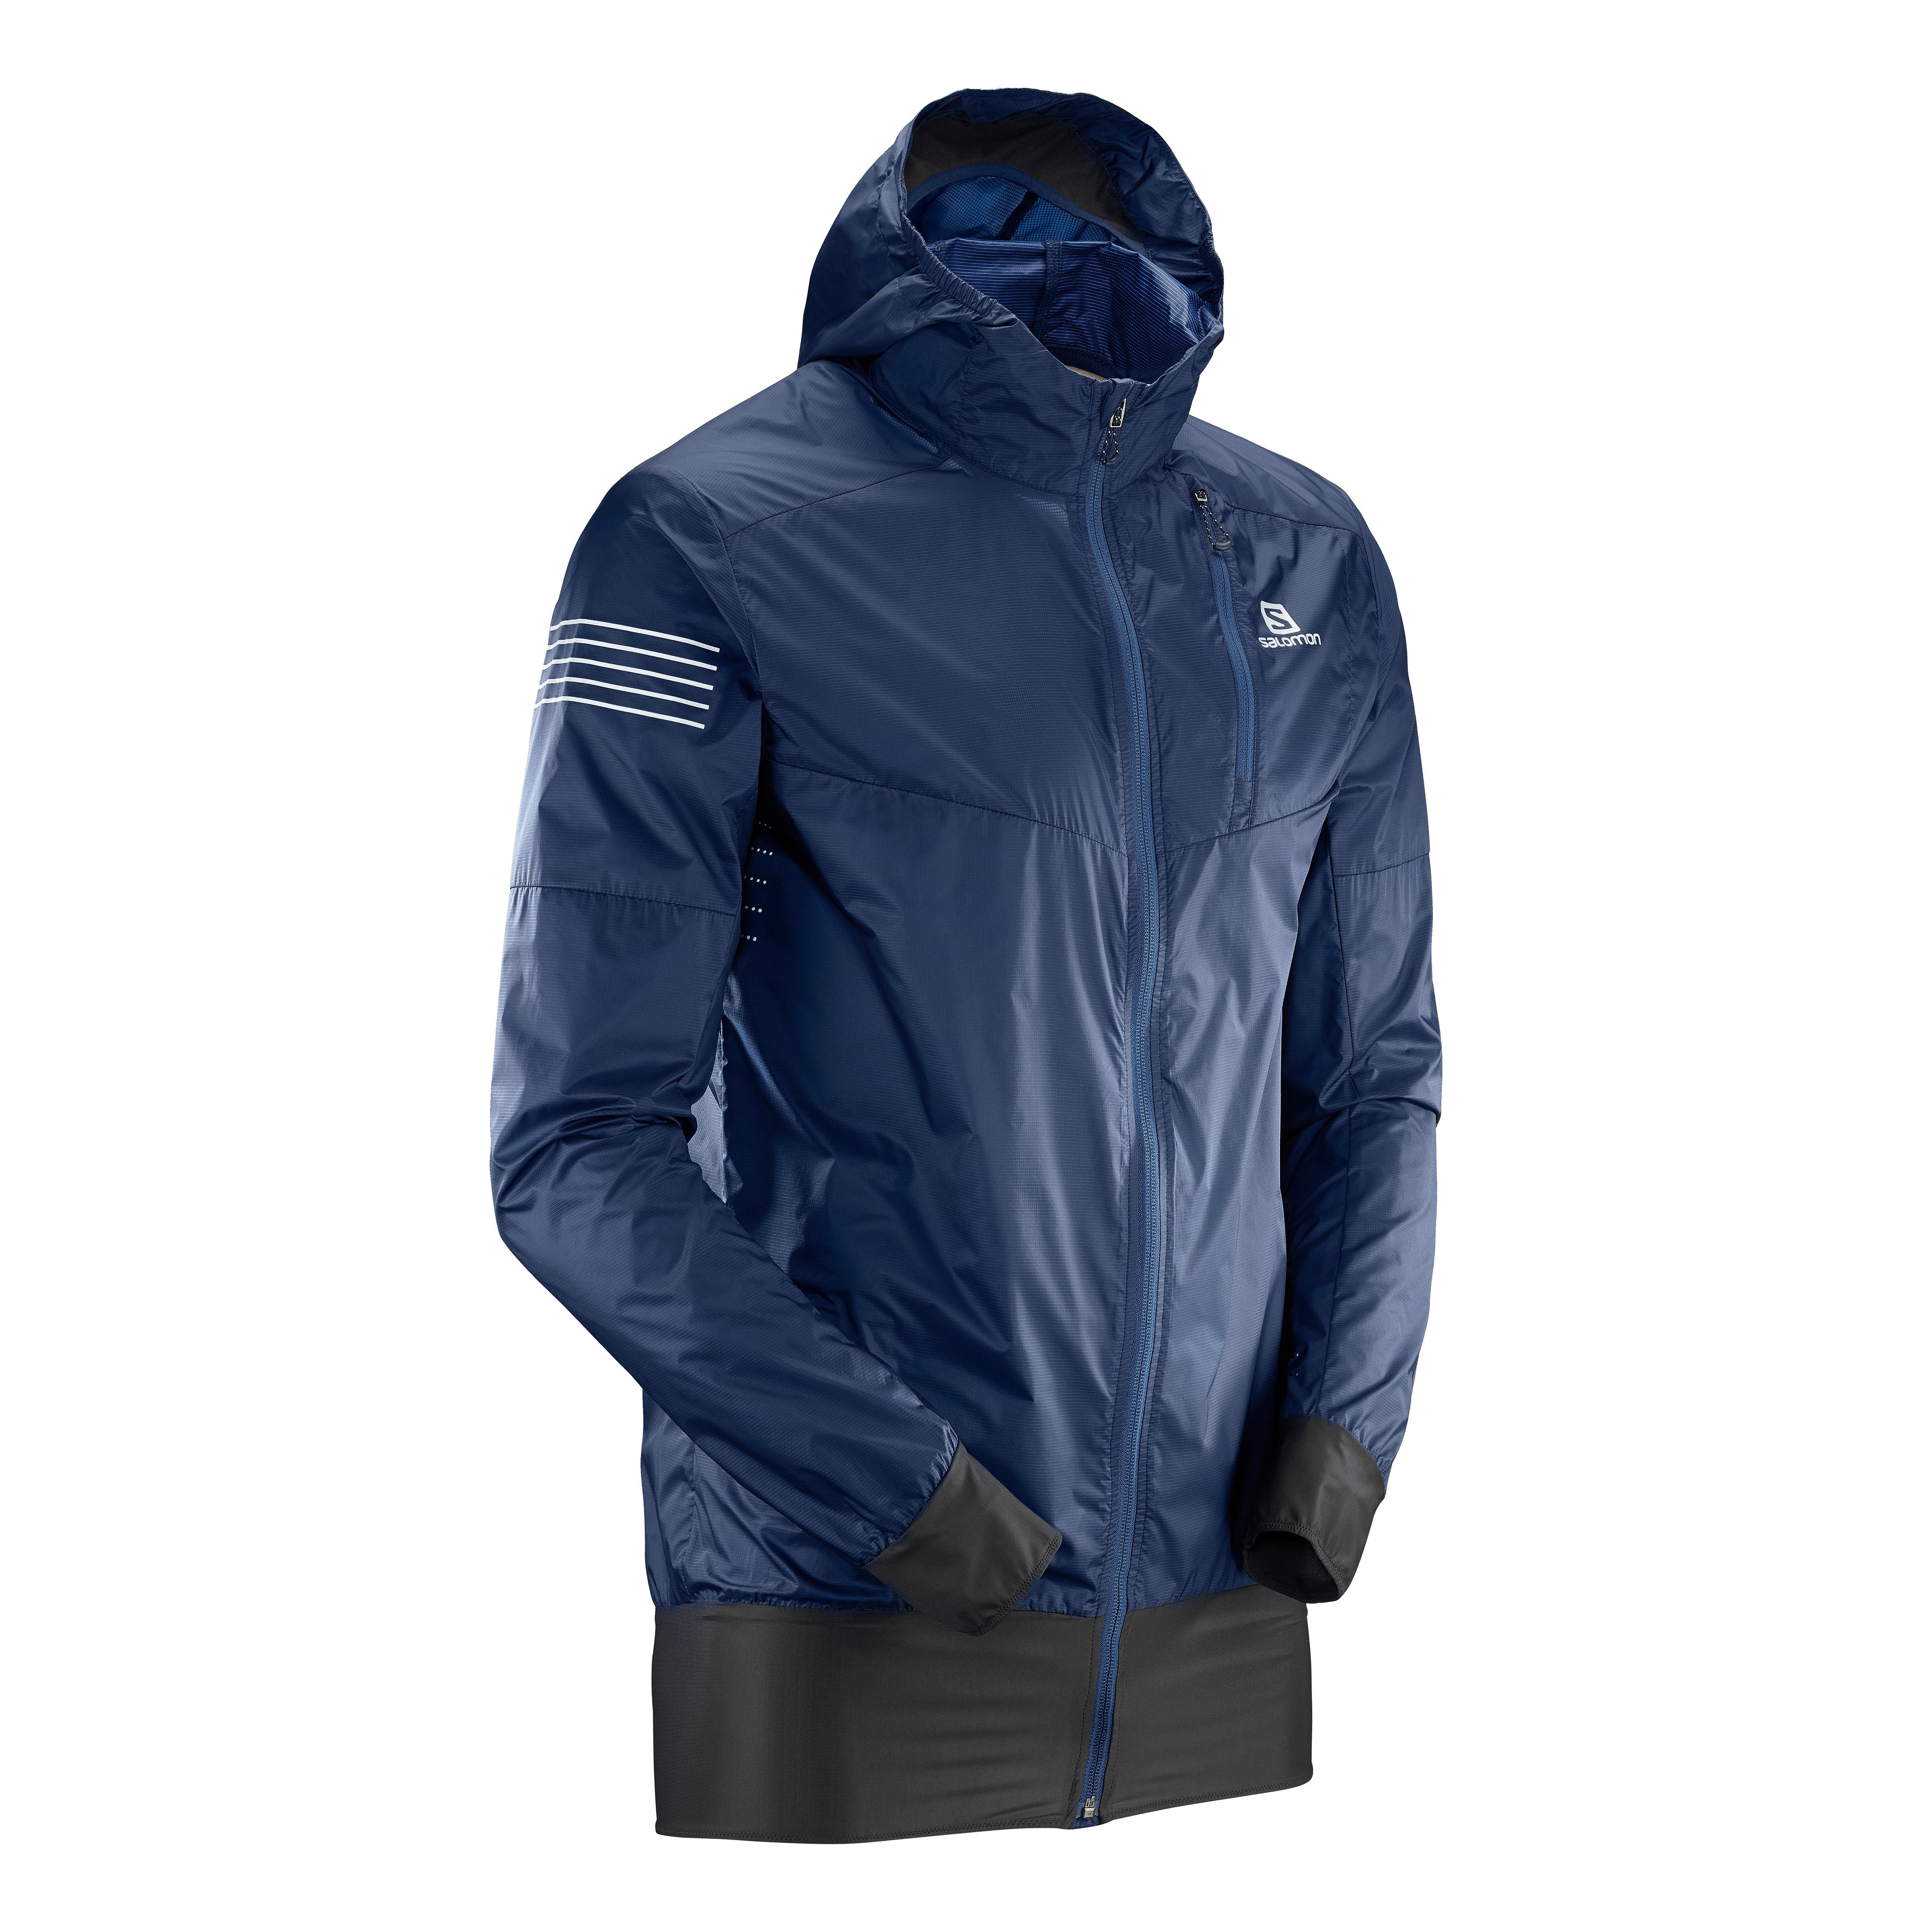 Salomon Fast Wing Hybrid Jacket Bleu Homme | LEPAPE